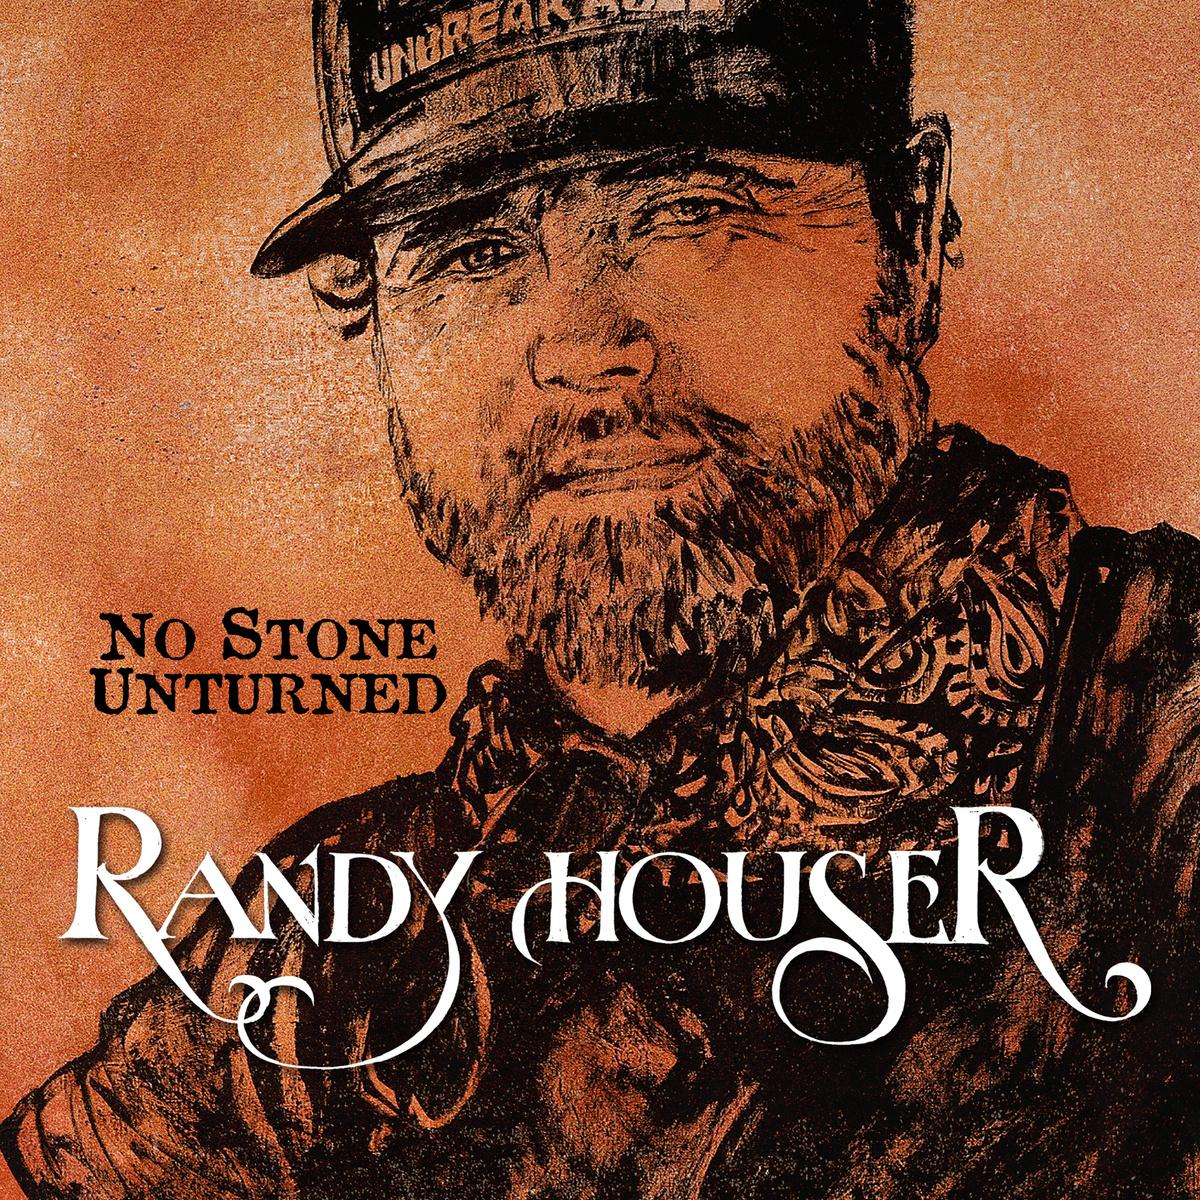 randy-houser-no-stone